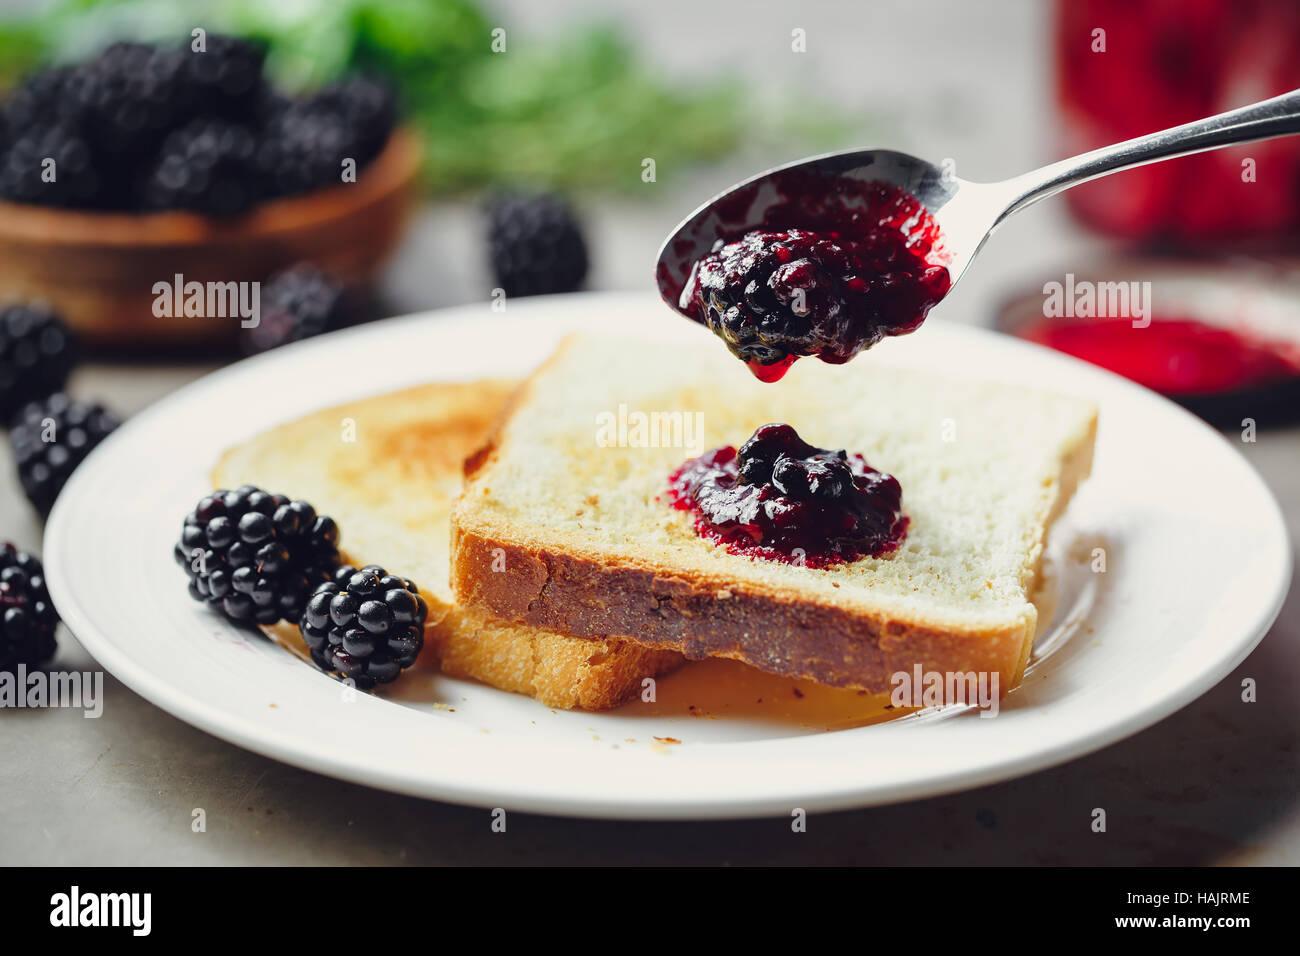 Toast with homemade blackberry jam - Stock Image